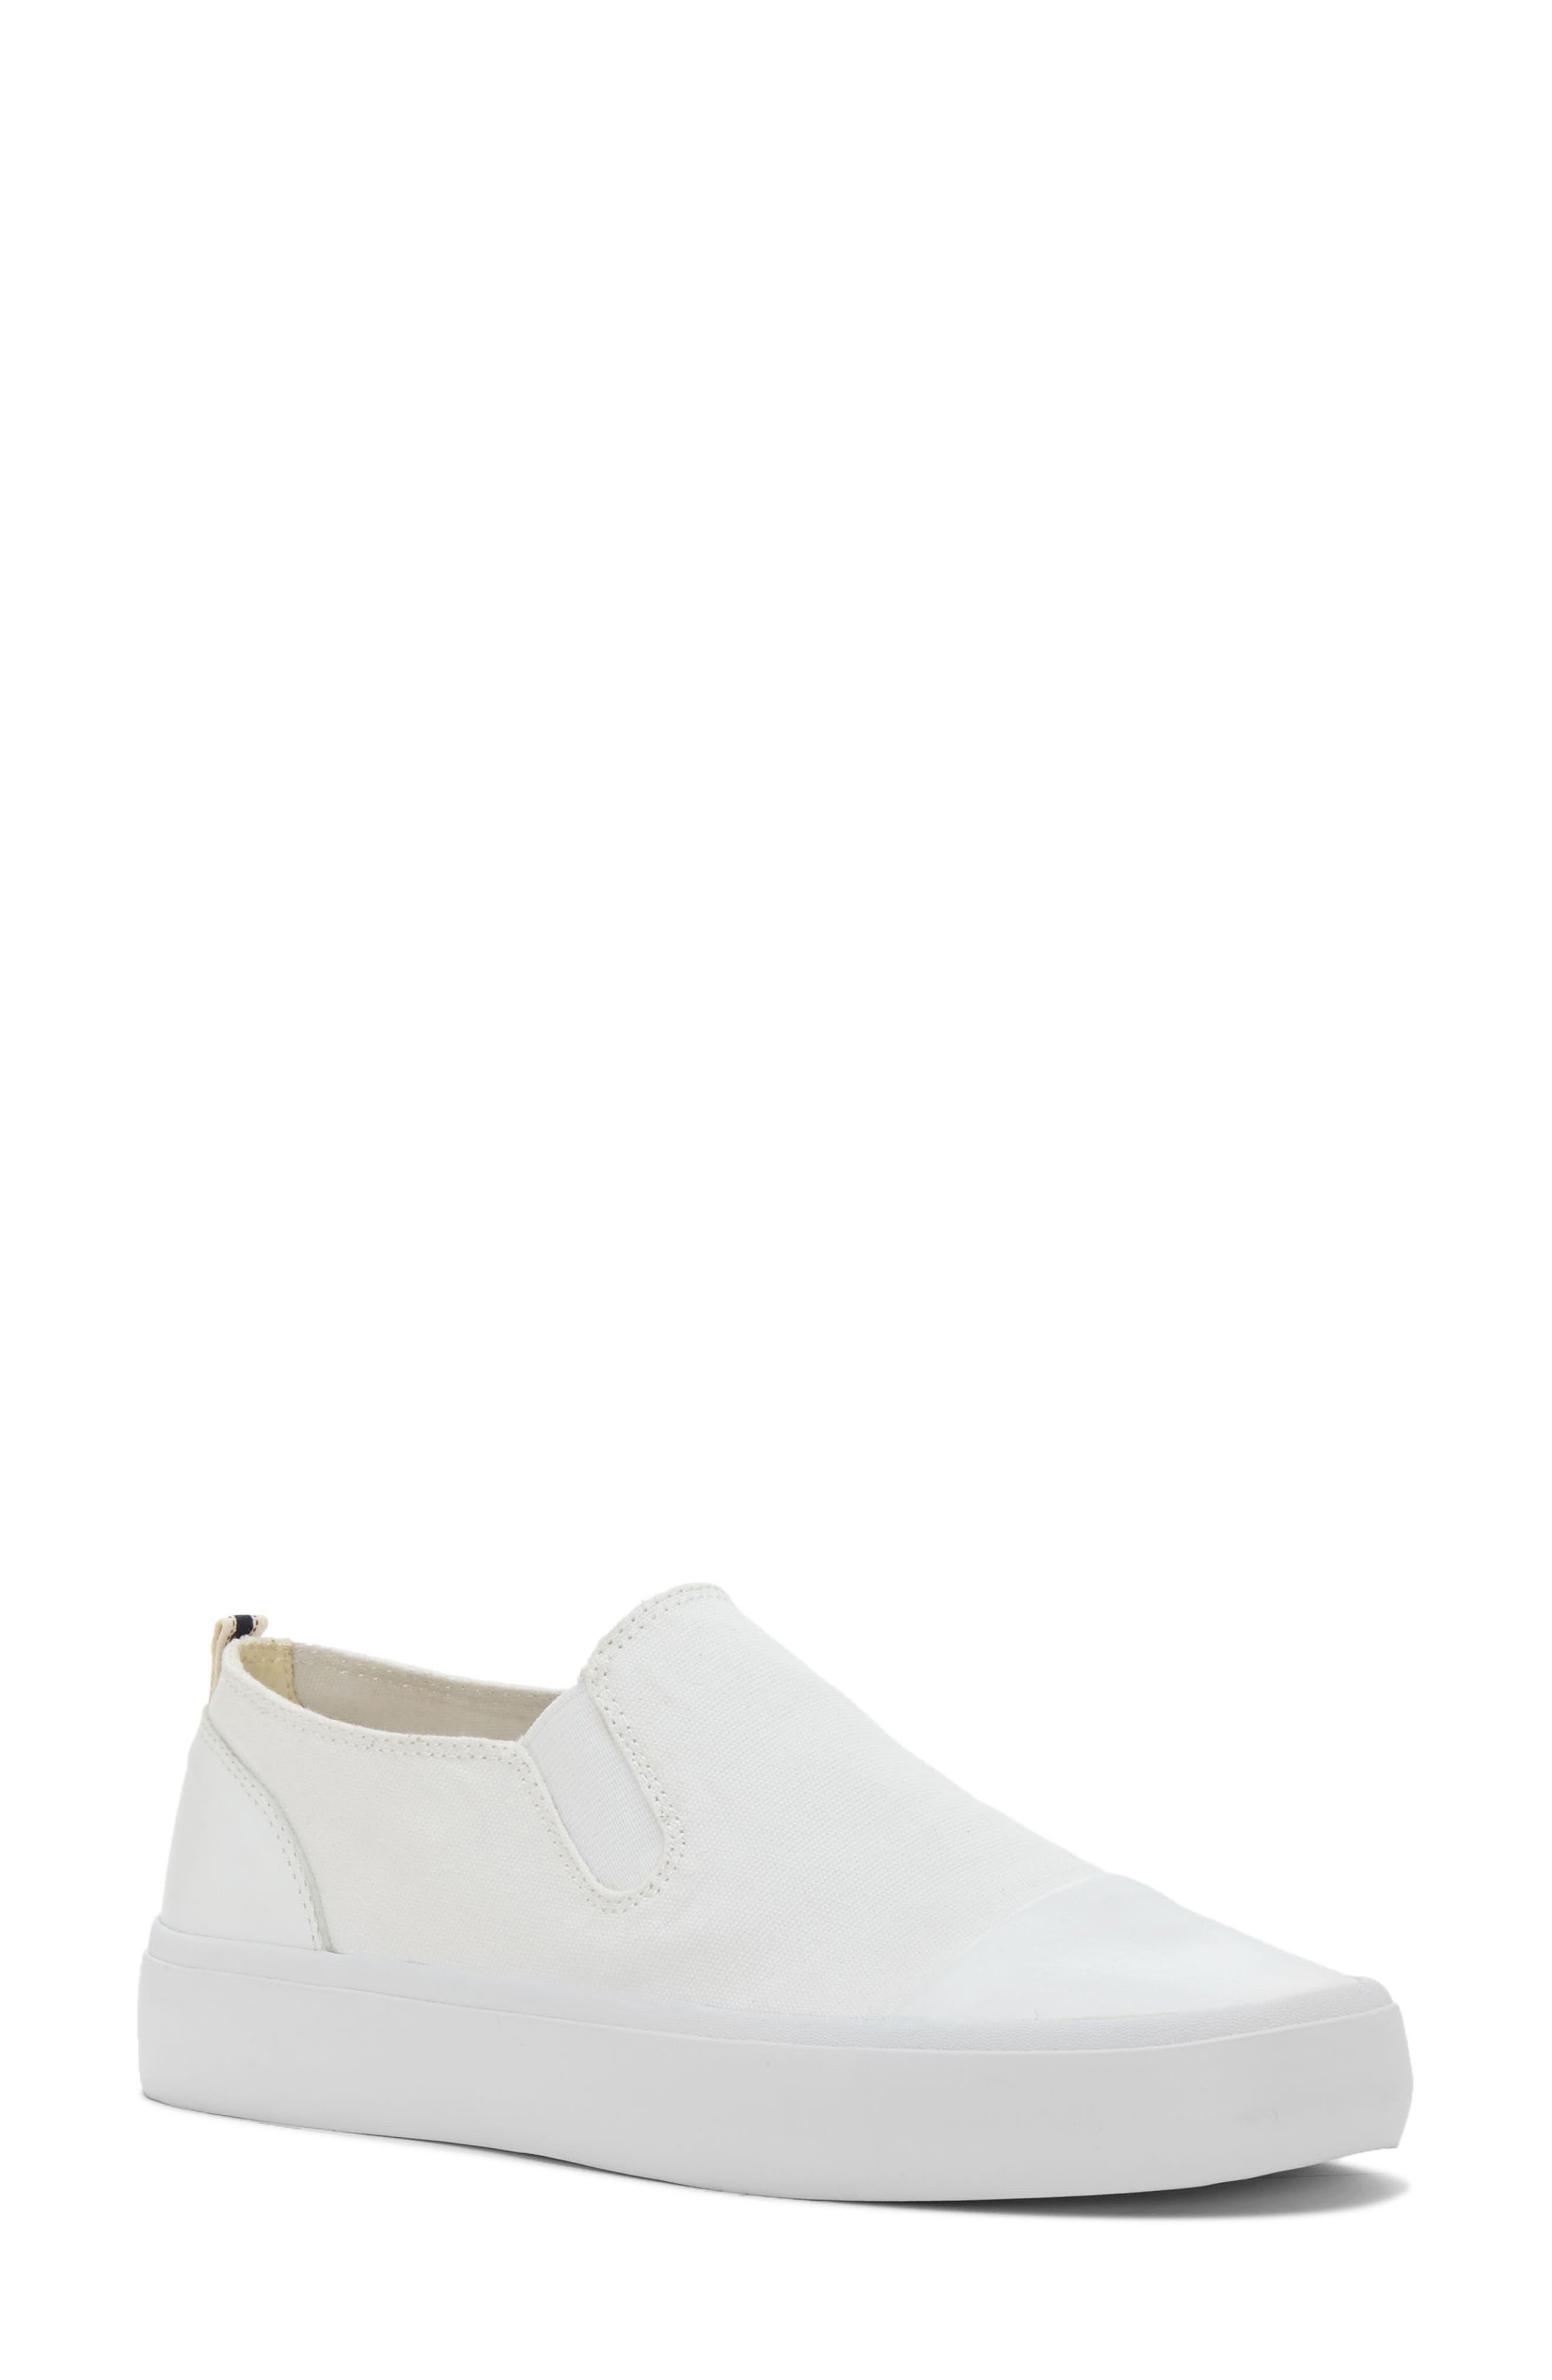 Darja Slip-On Sneaker,                         Main,                         color, Pure White Fabric